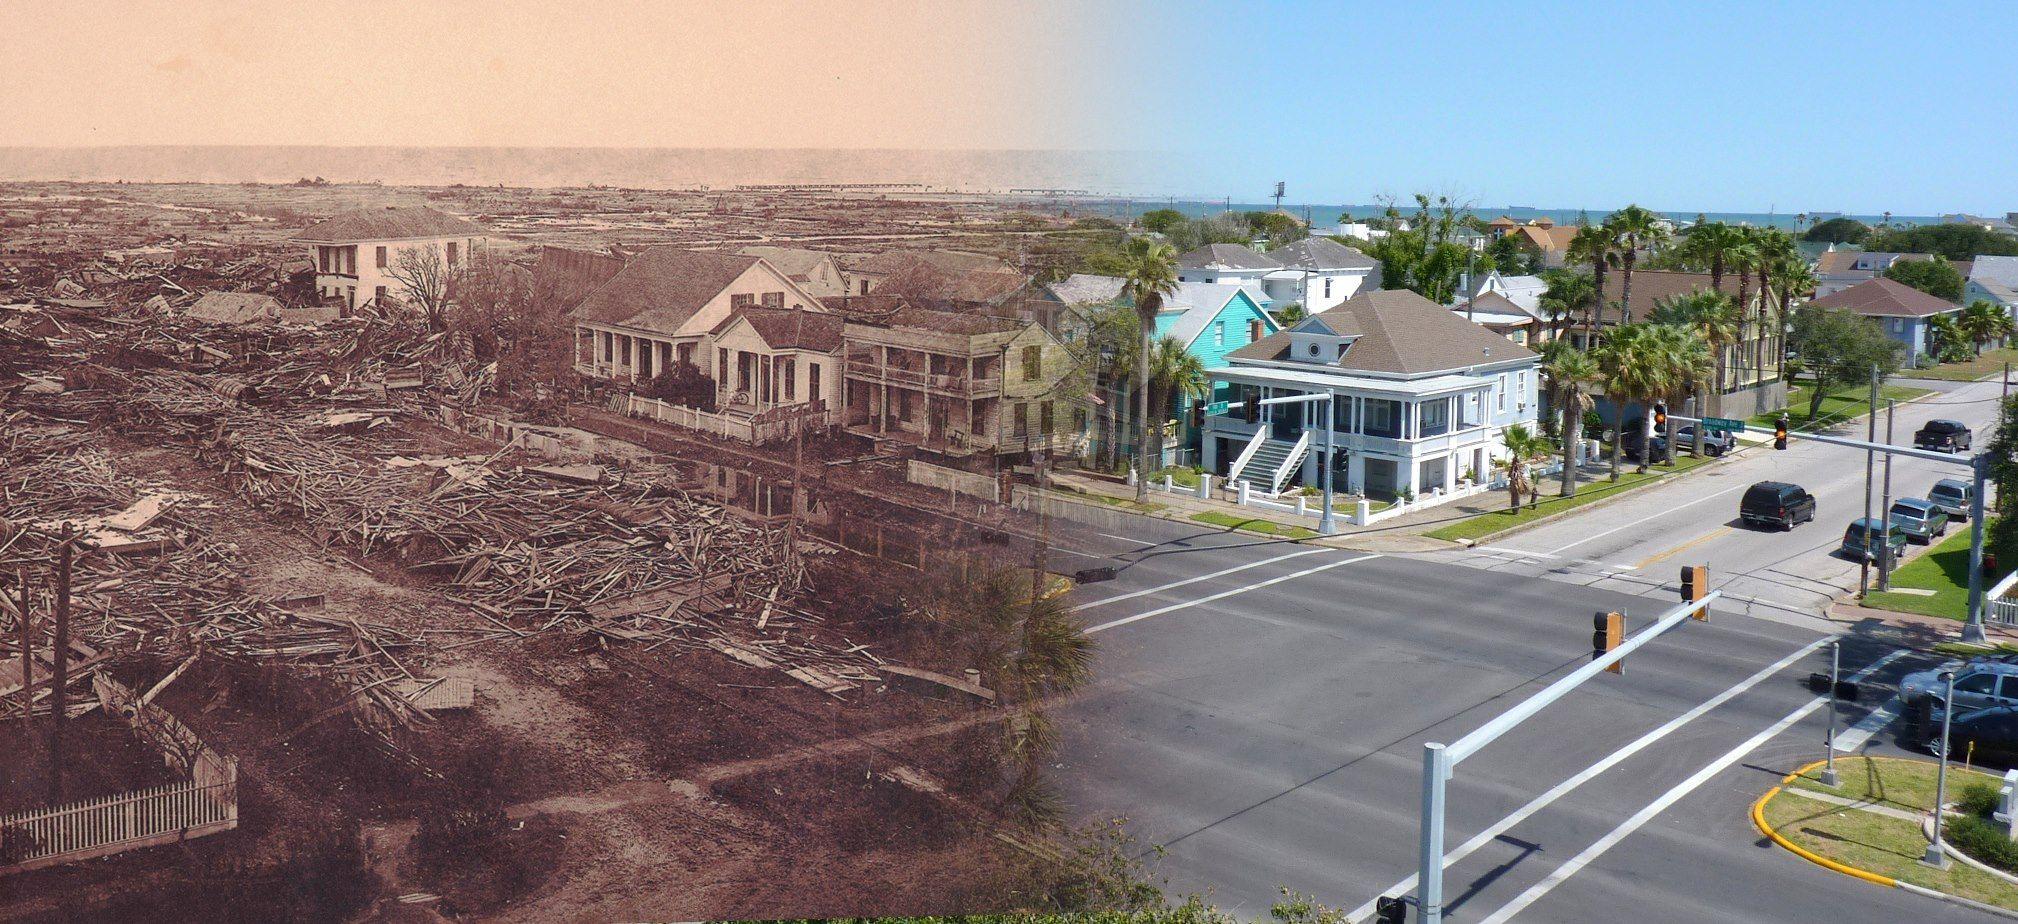 After Disaster 8 U S Cities That Went From Ruin To Rebirth Galveston Hurricane Galveston 1900 Galveston Hurricane